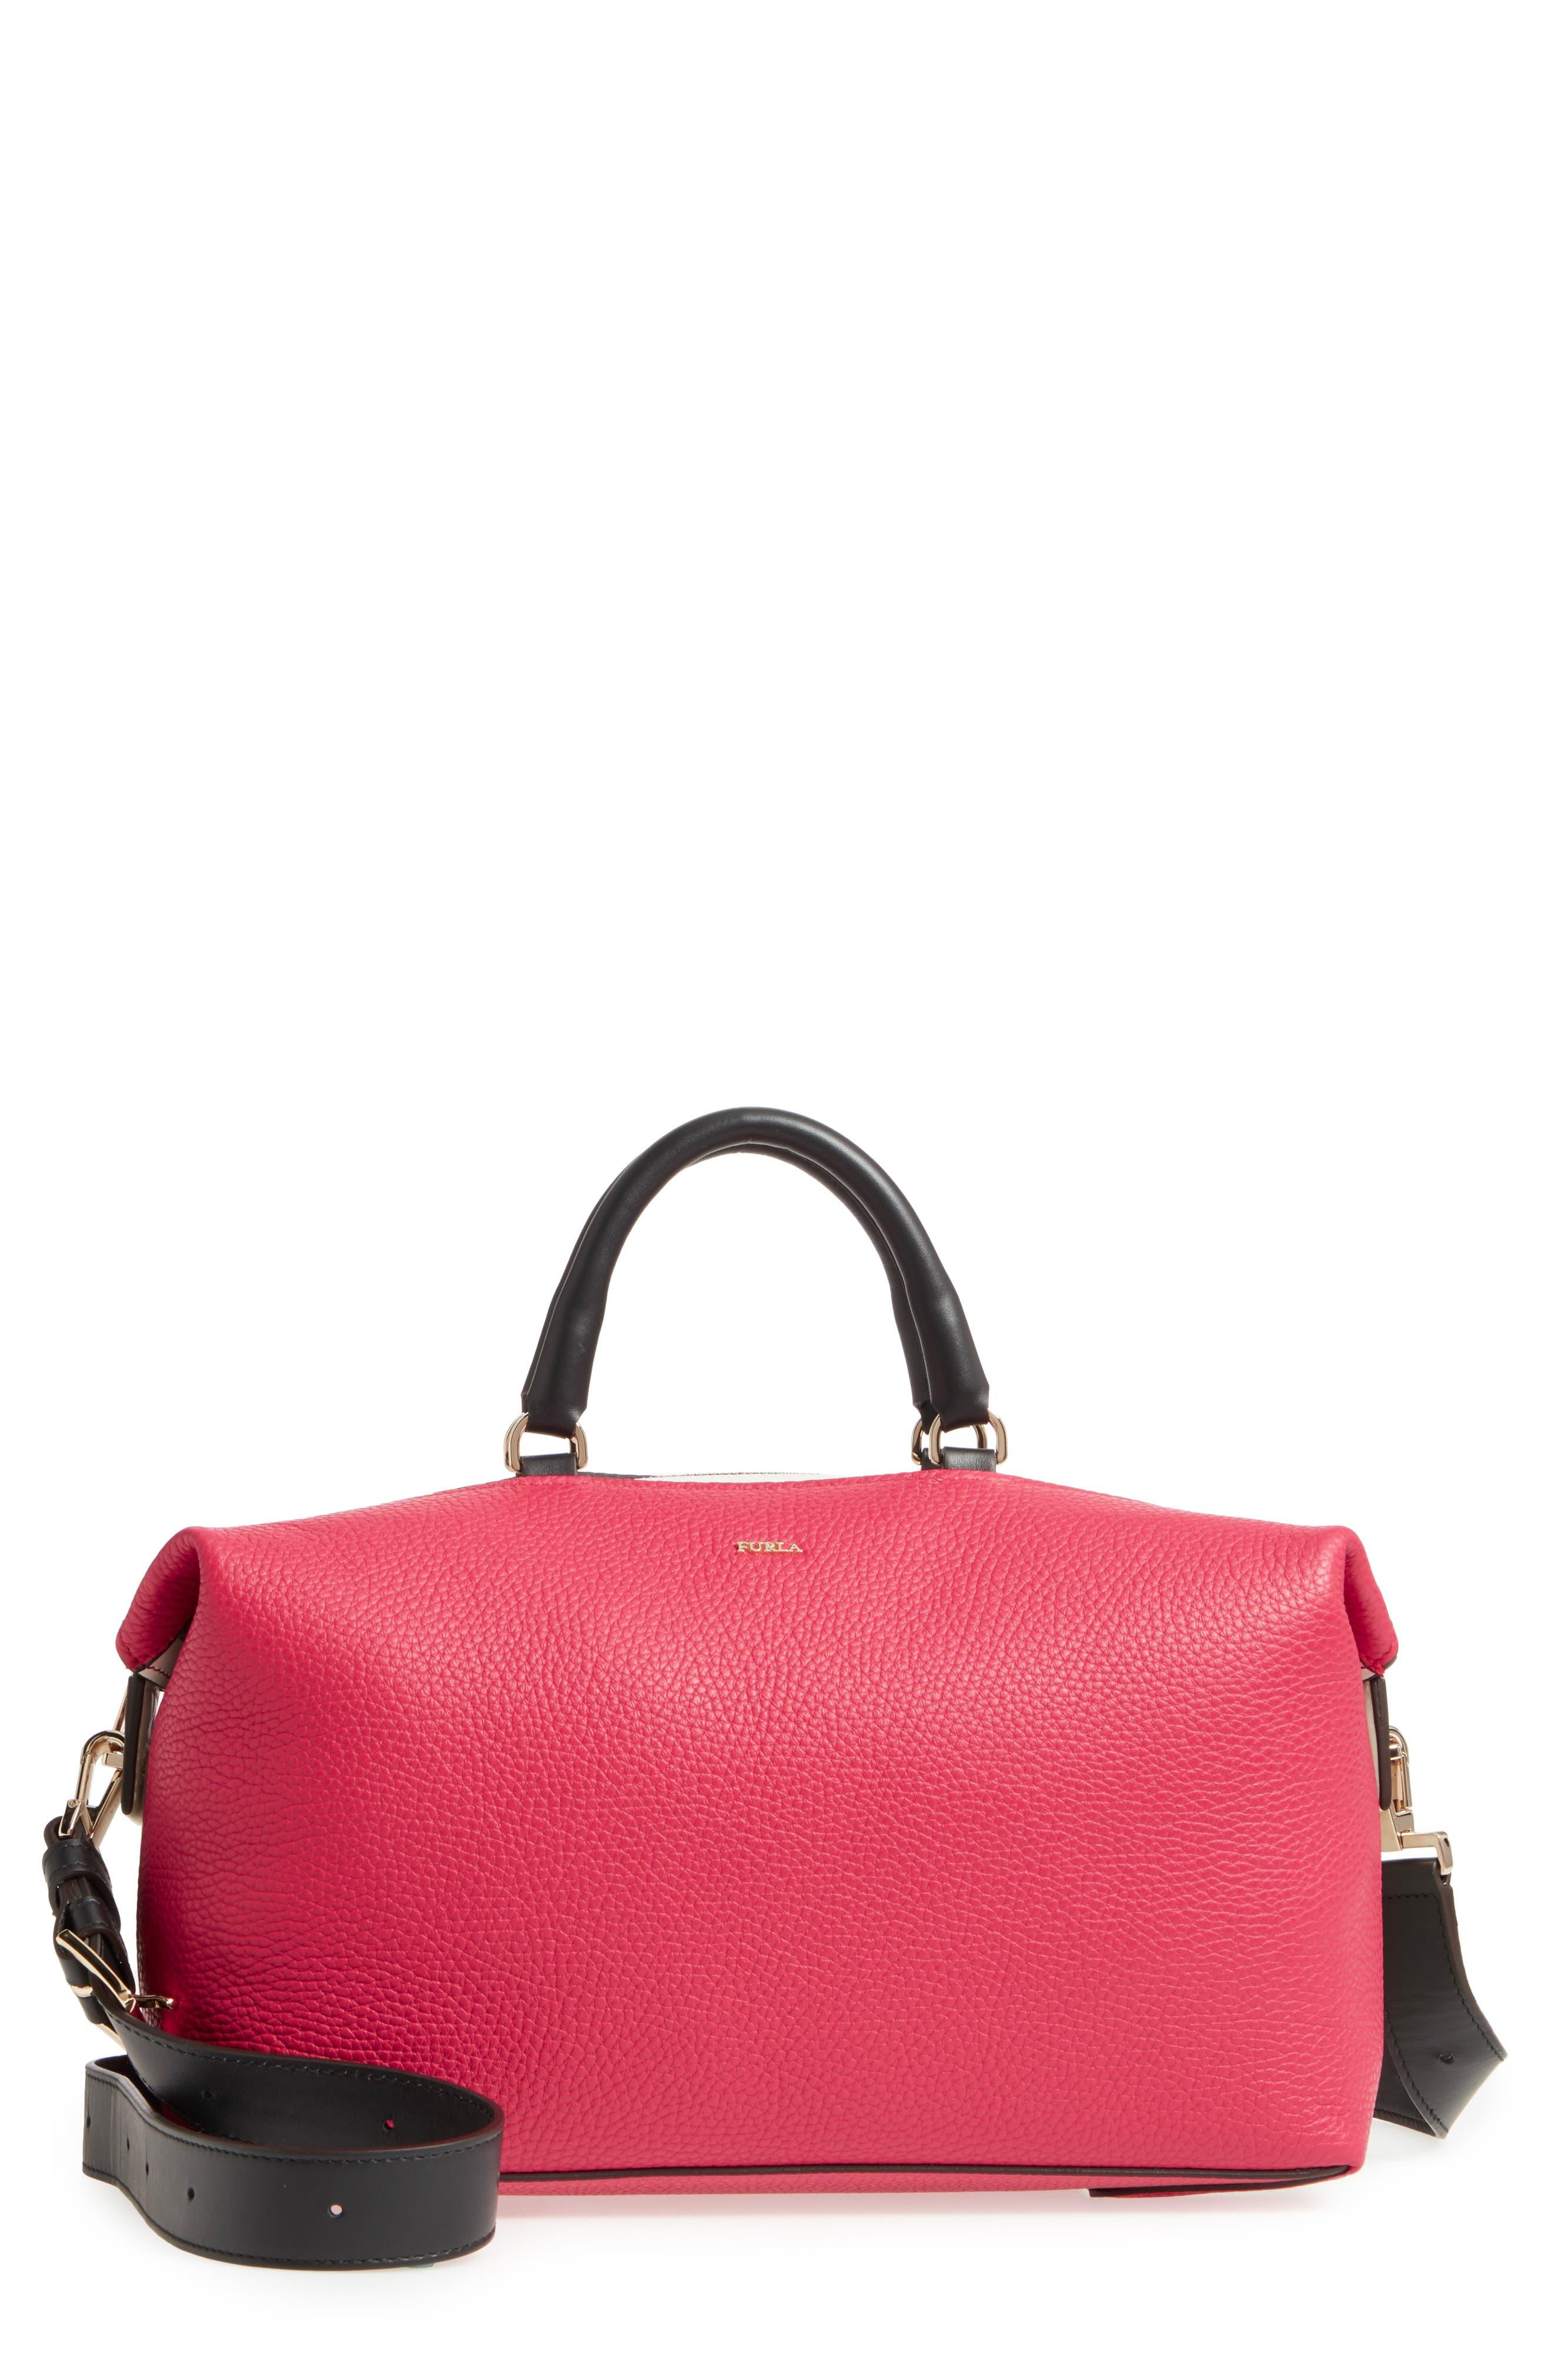 Blogger Colorblock Leather Satchel,                         Main,                         color, 625